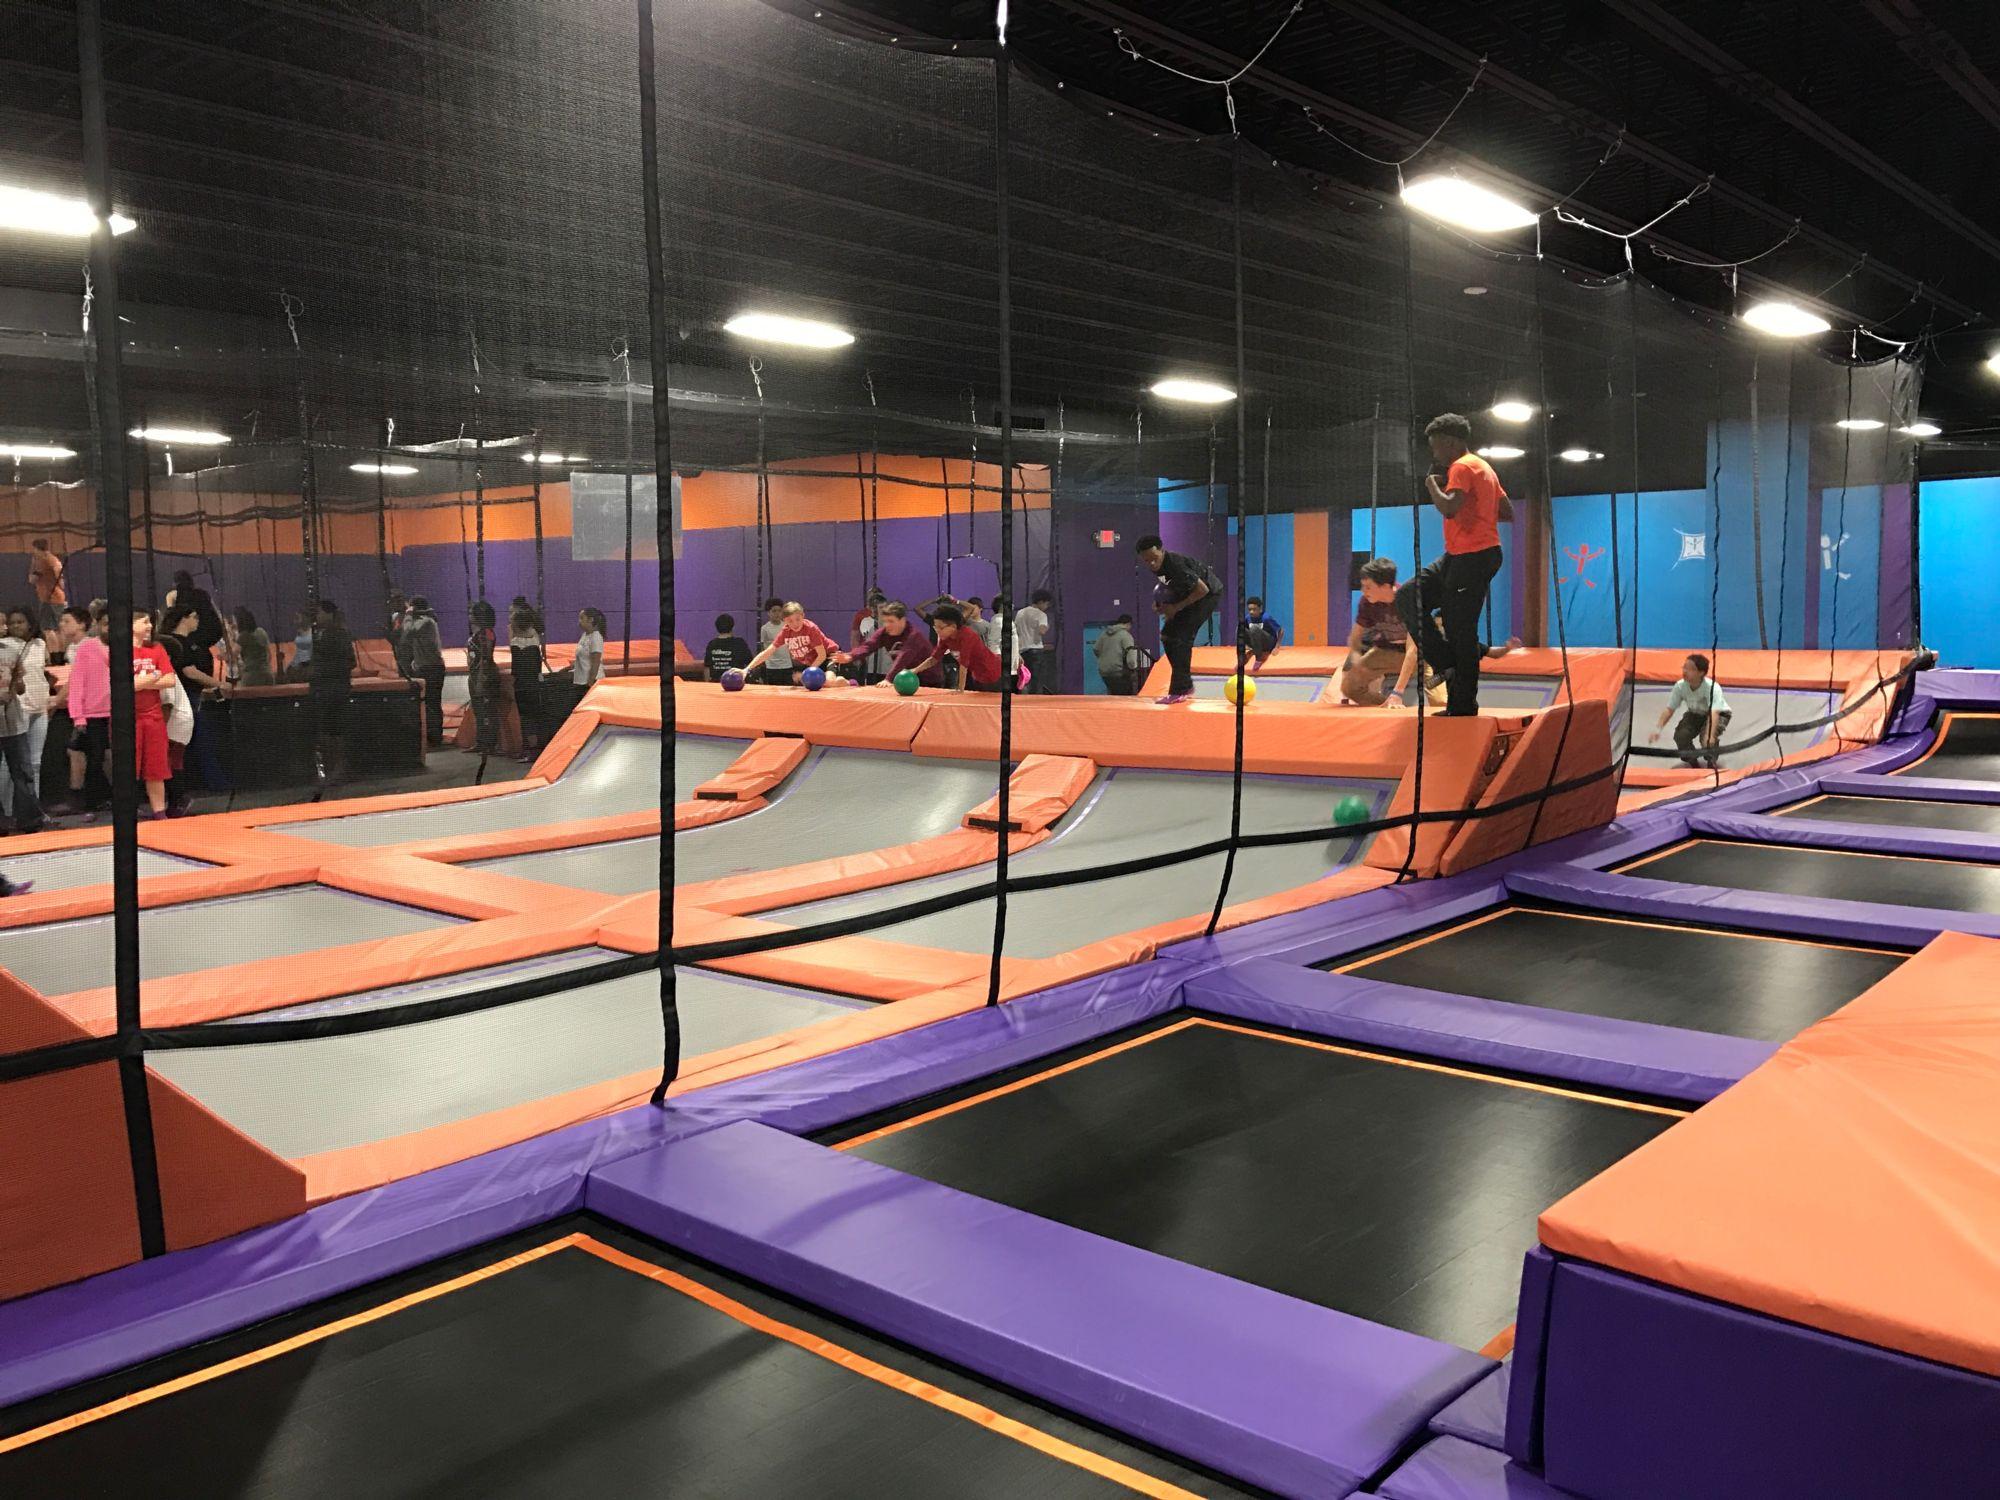 playing_dodgeball_indoors